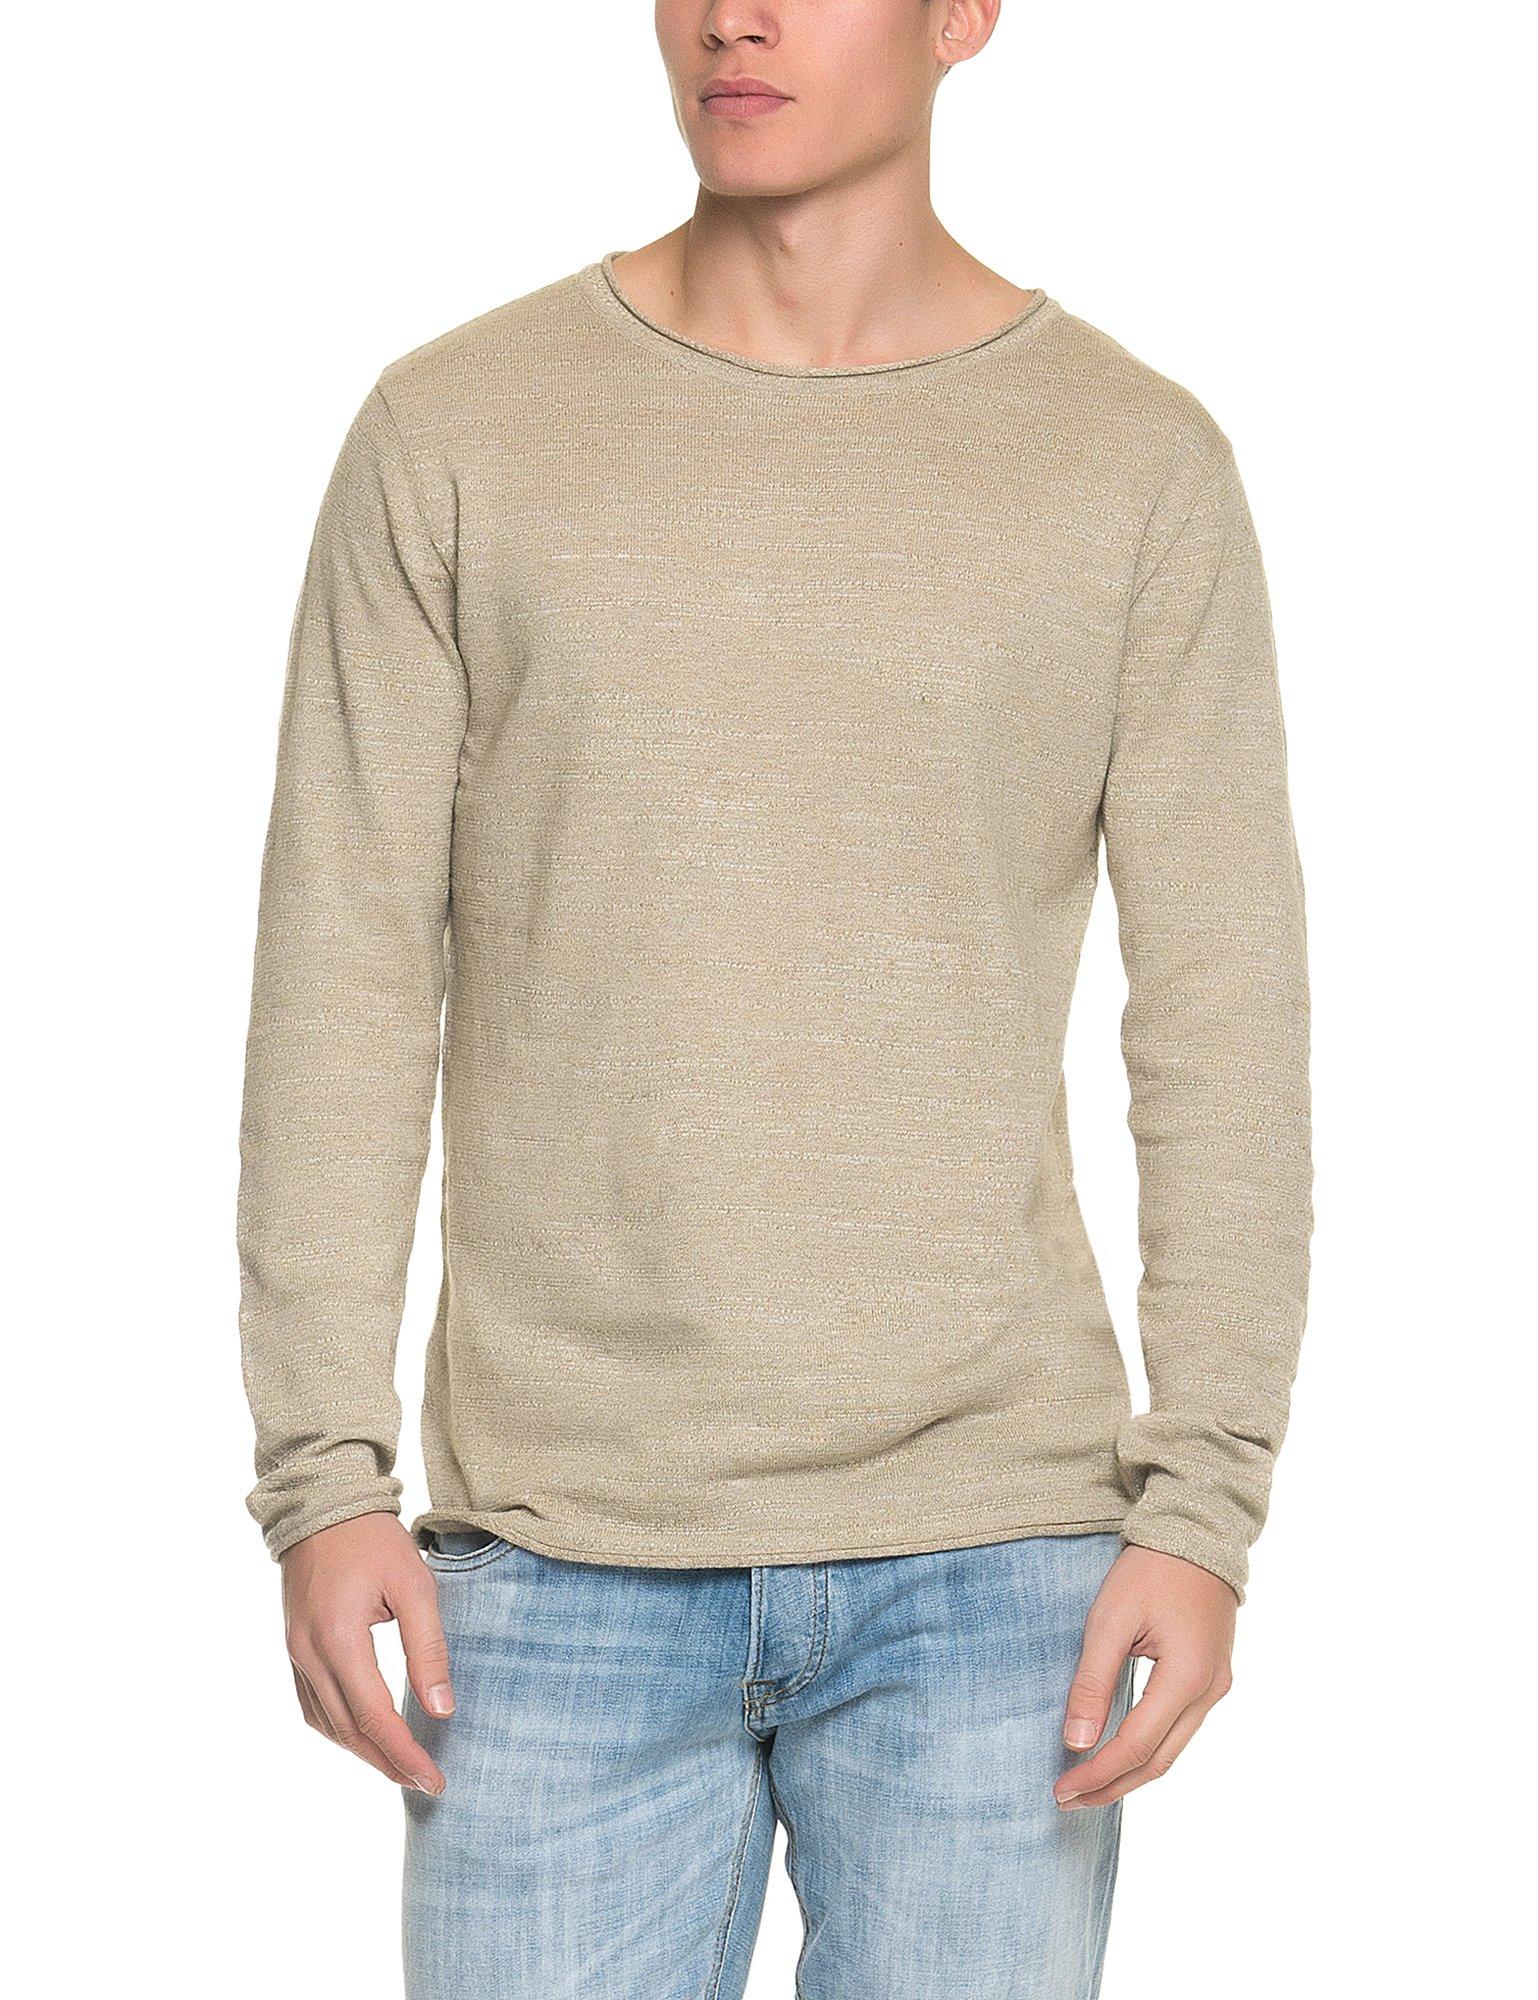 Garcia Jeans Men's Men's Beige Pullover in Size M Beige